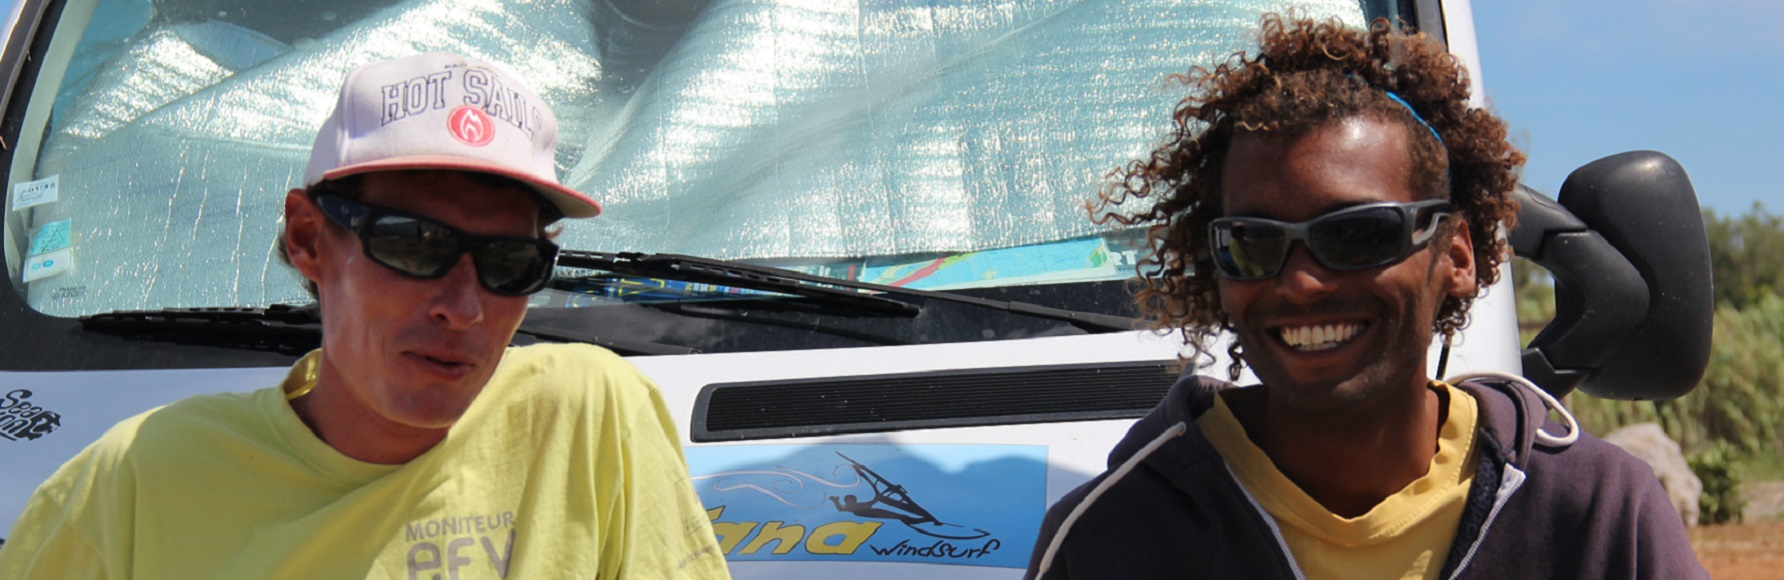 Kontakt zum Team von Tramontana Windsurf